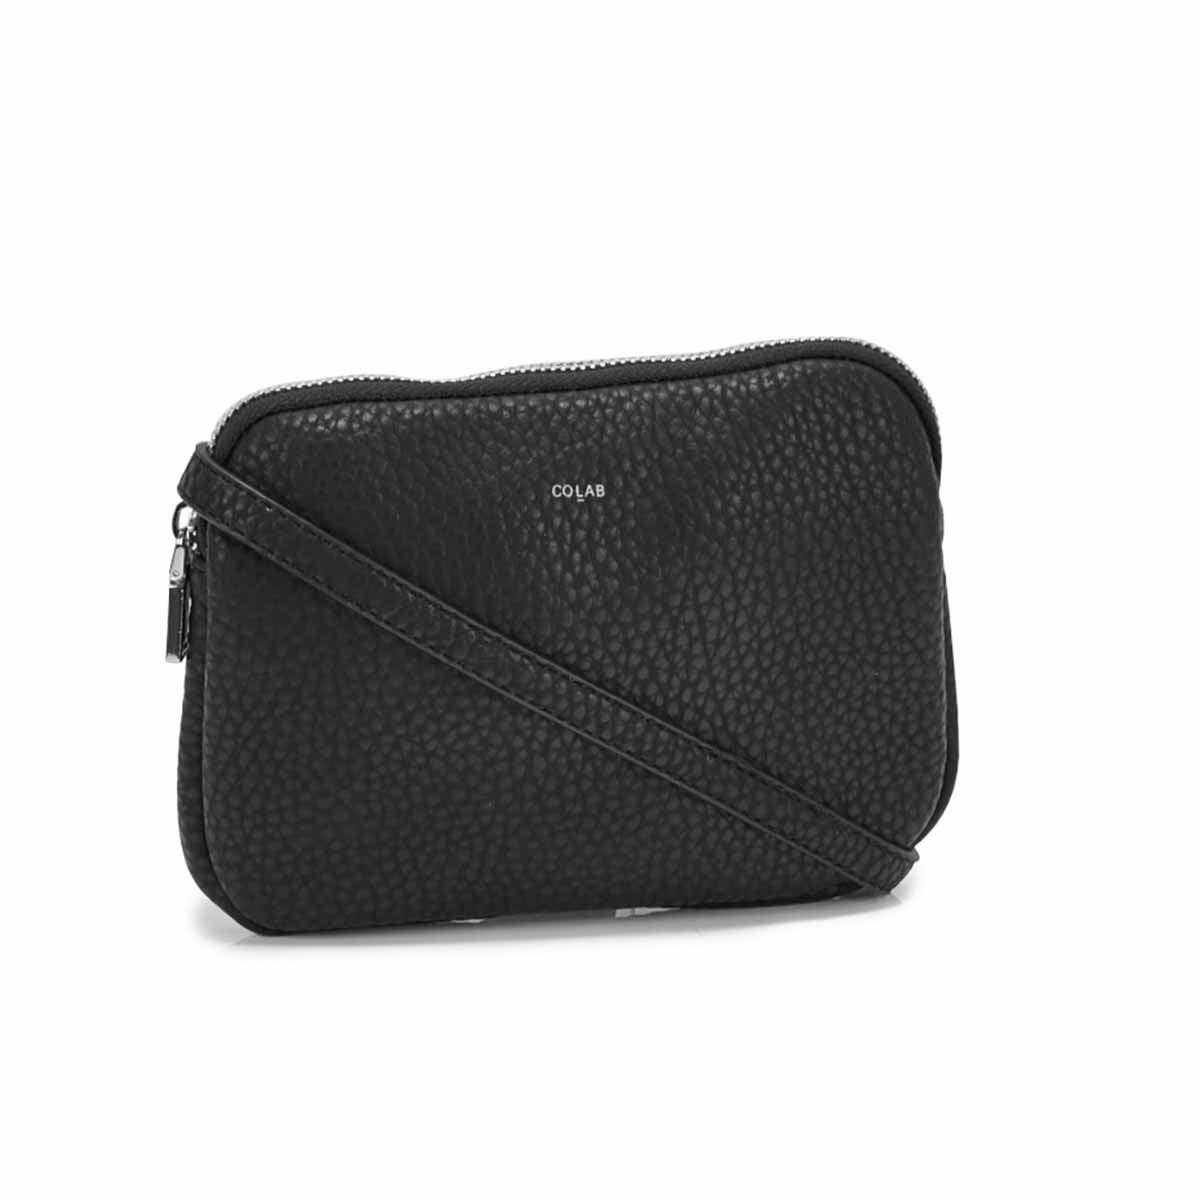 Women's SYDNEY cross body black zip up wallet